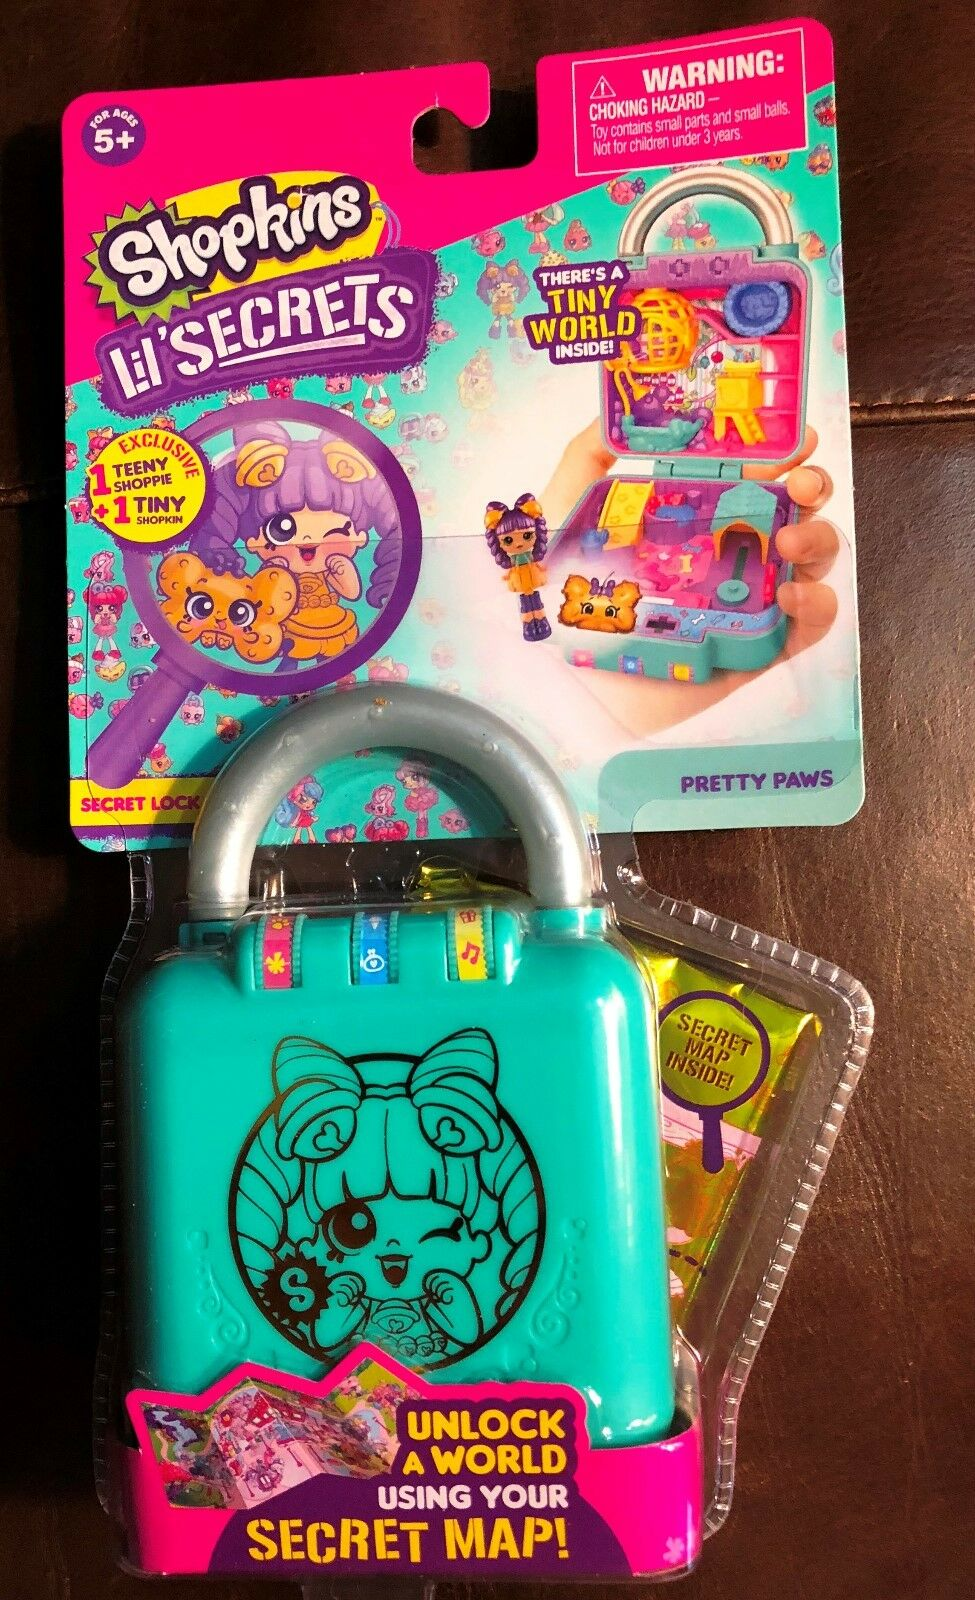 New Shopkins Lil' Secrets Lock Pretty Paws Playset Tiny World Light Square Green